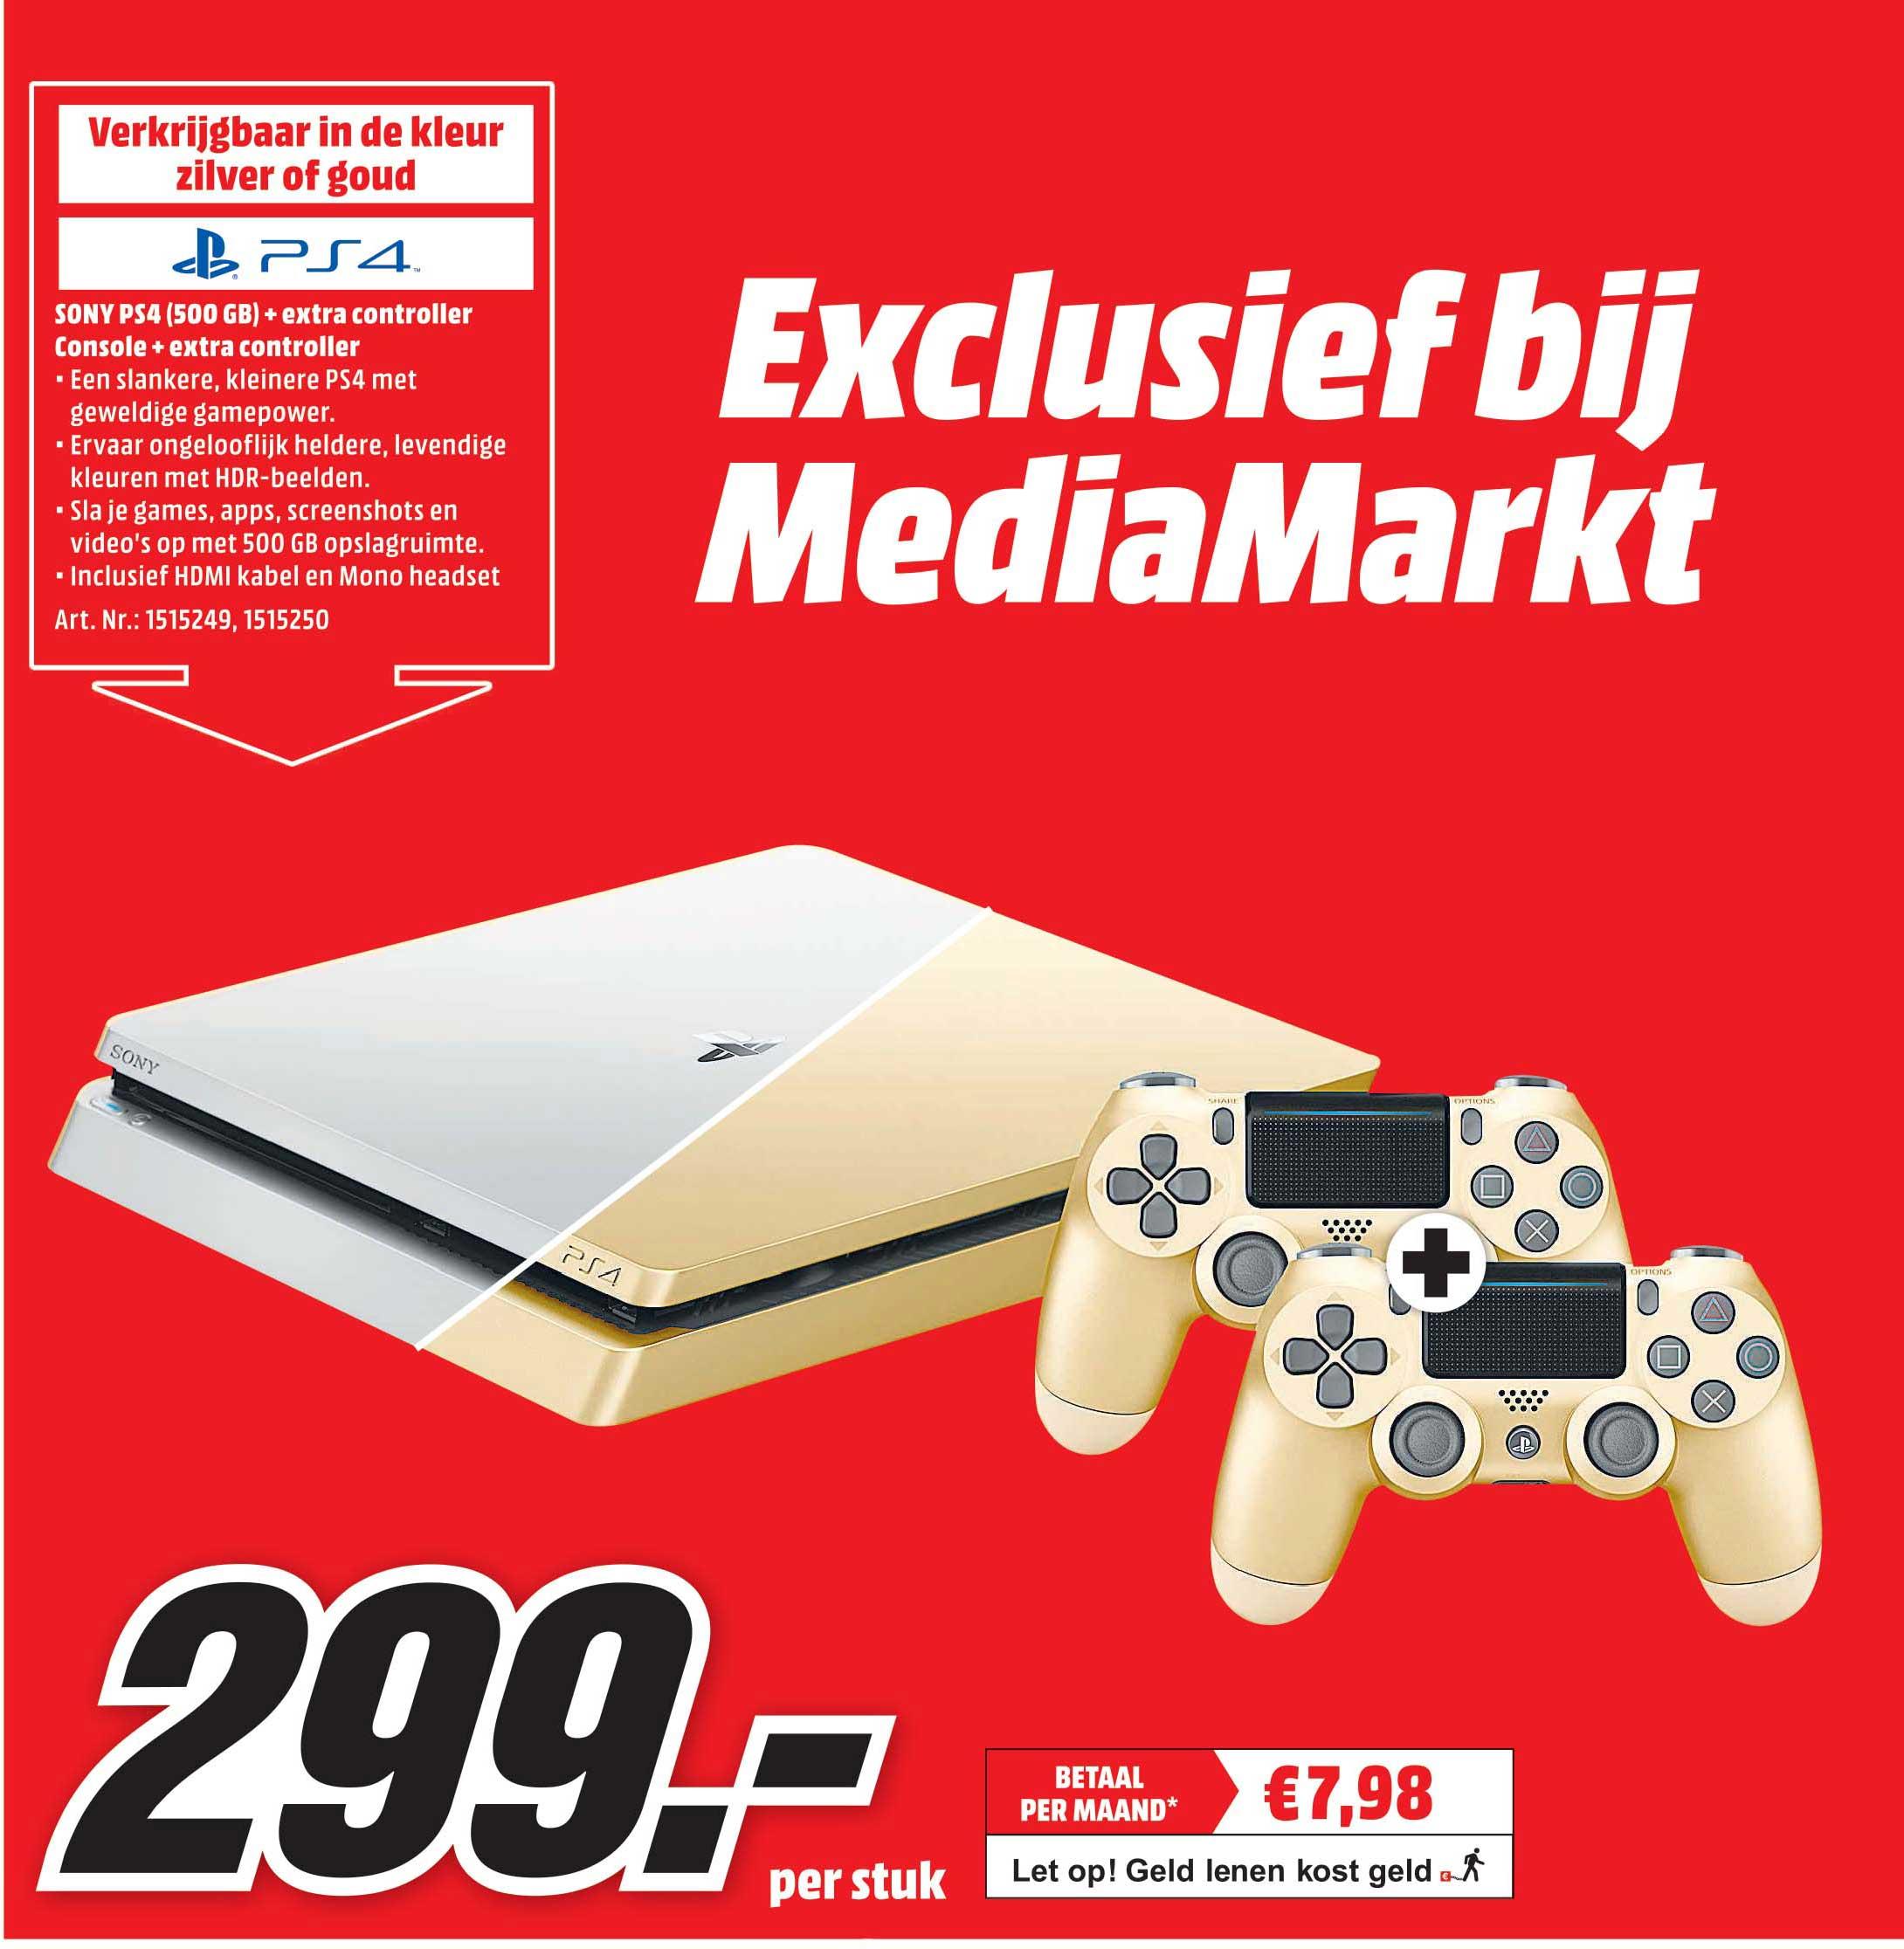 MediaMarkt Sony PS4 500 GB + 2 Controllers